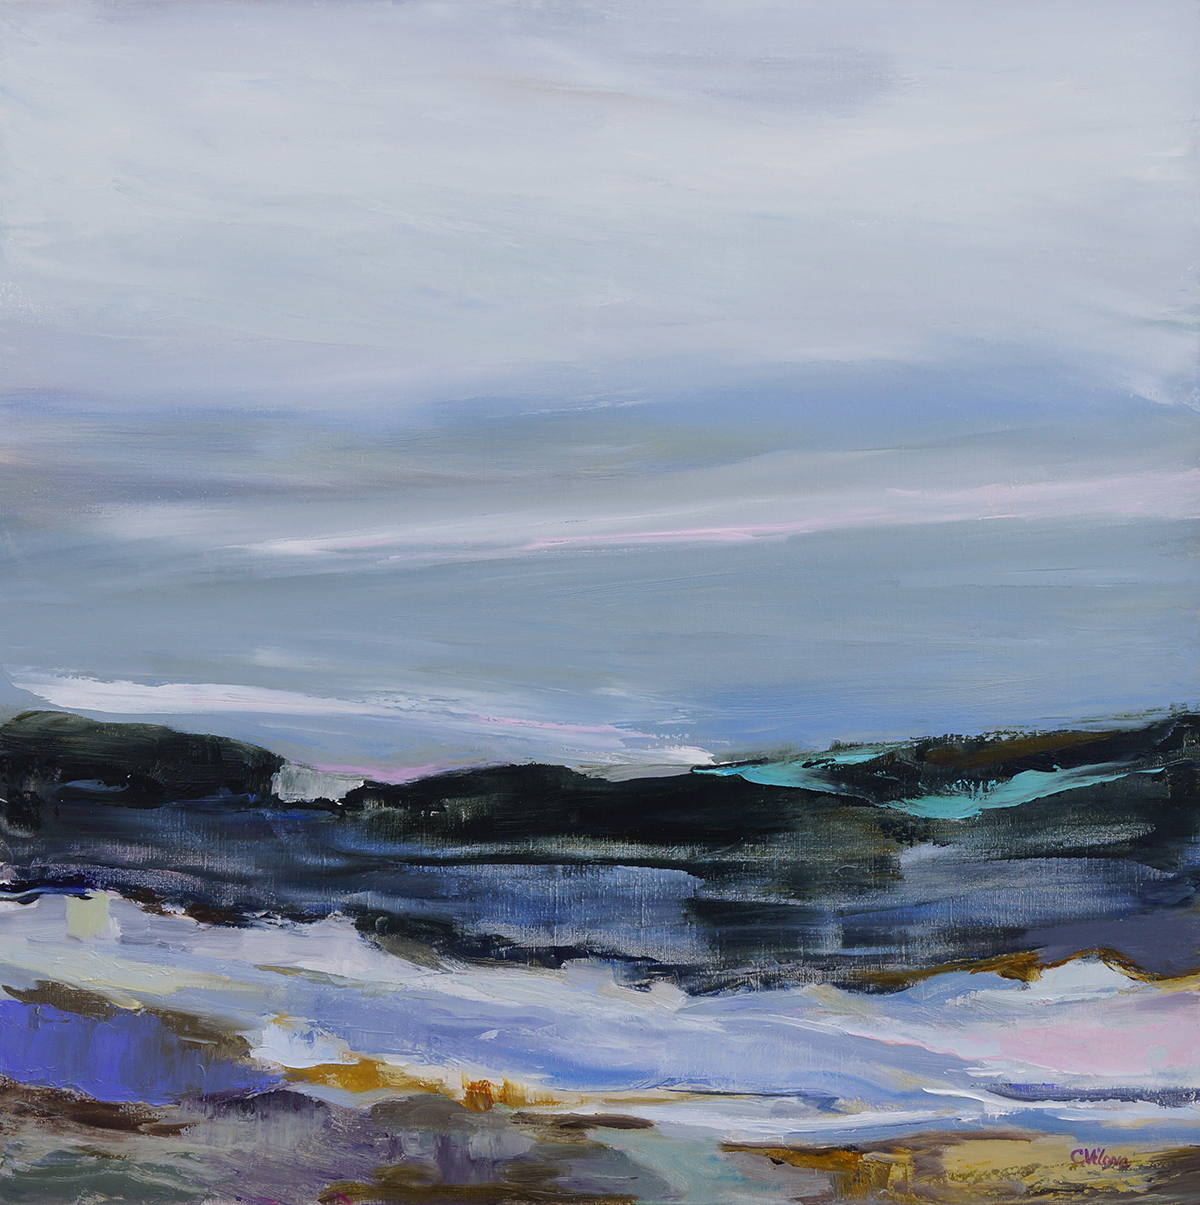 Hudson Evening, 30x30, Sold